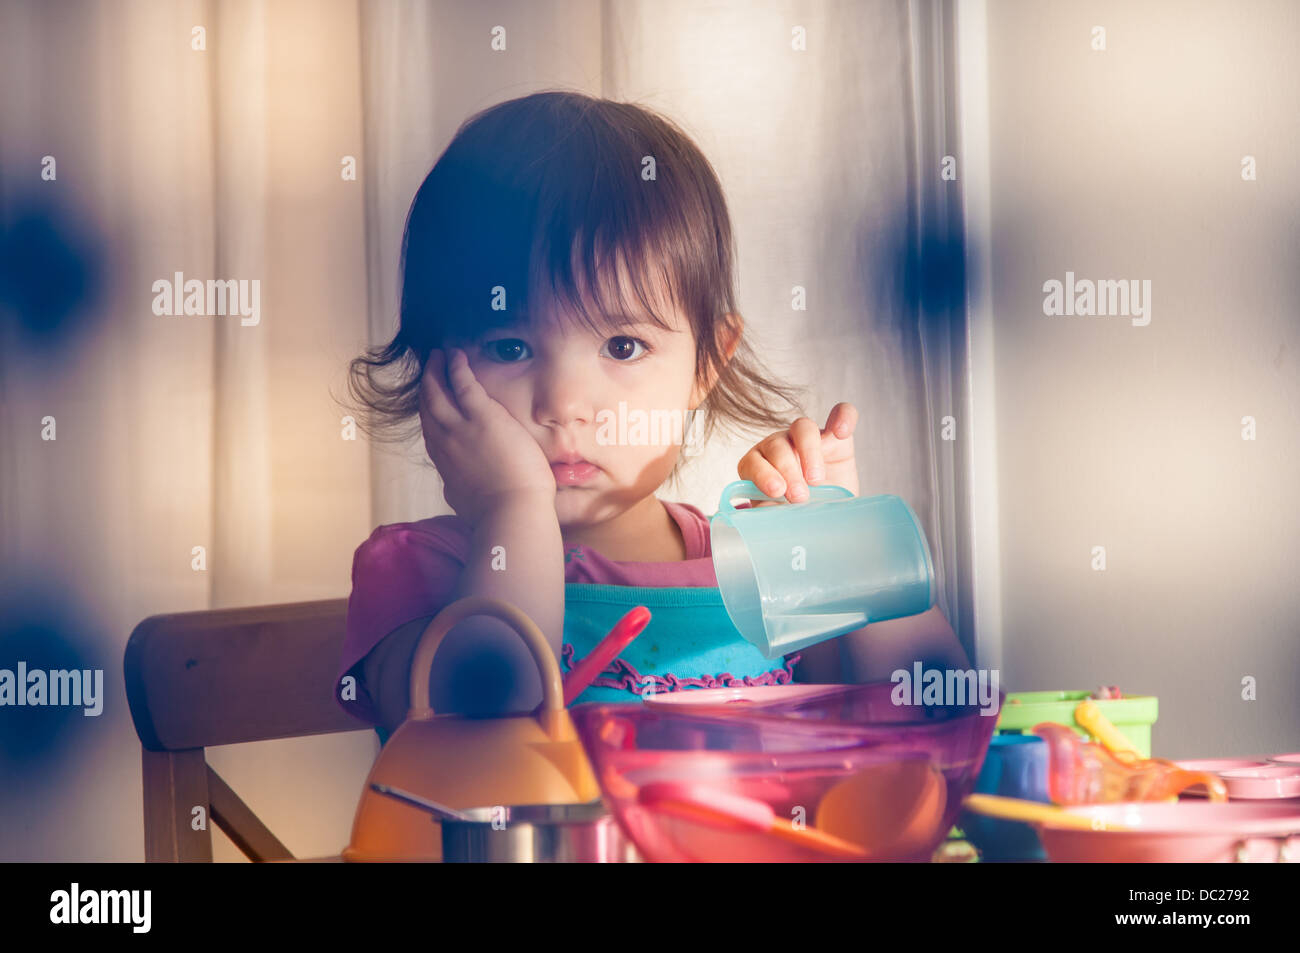 Sad girl playing with toys Stock Photo